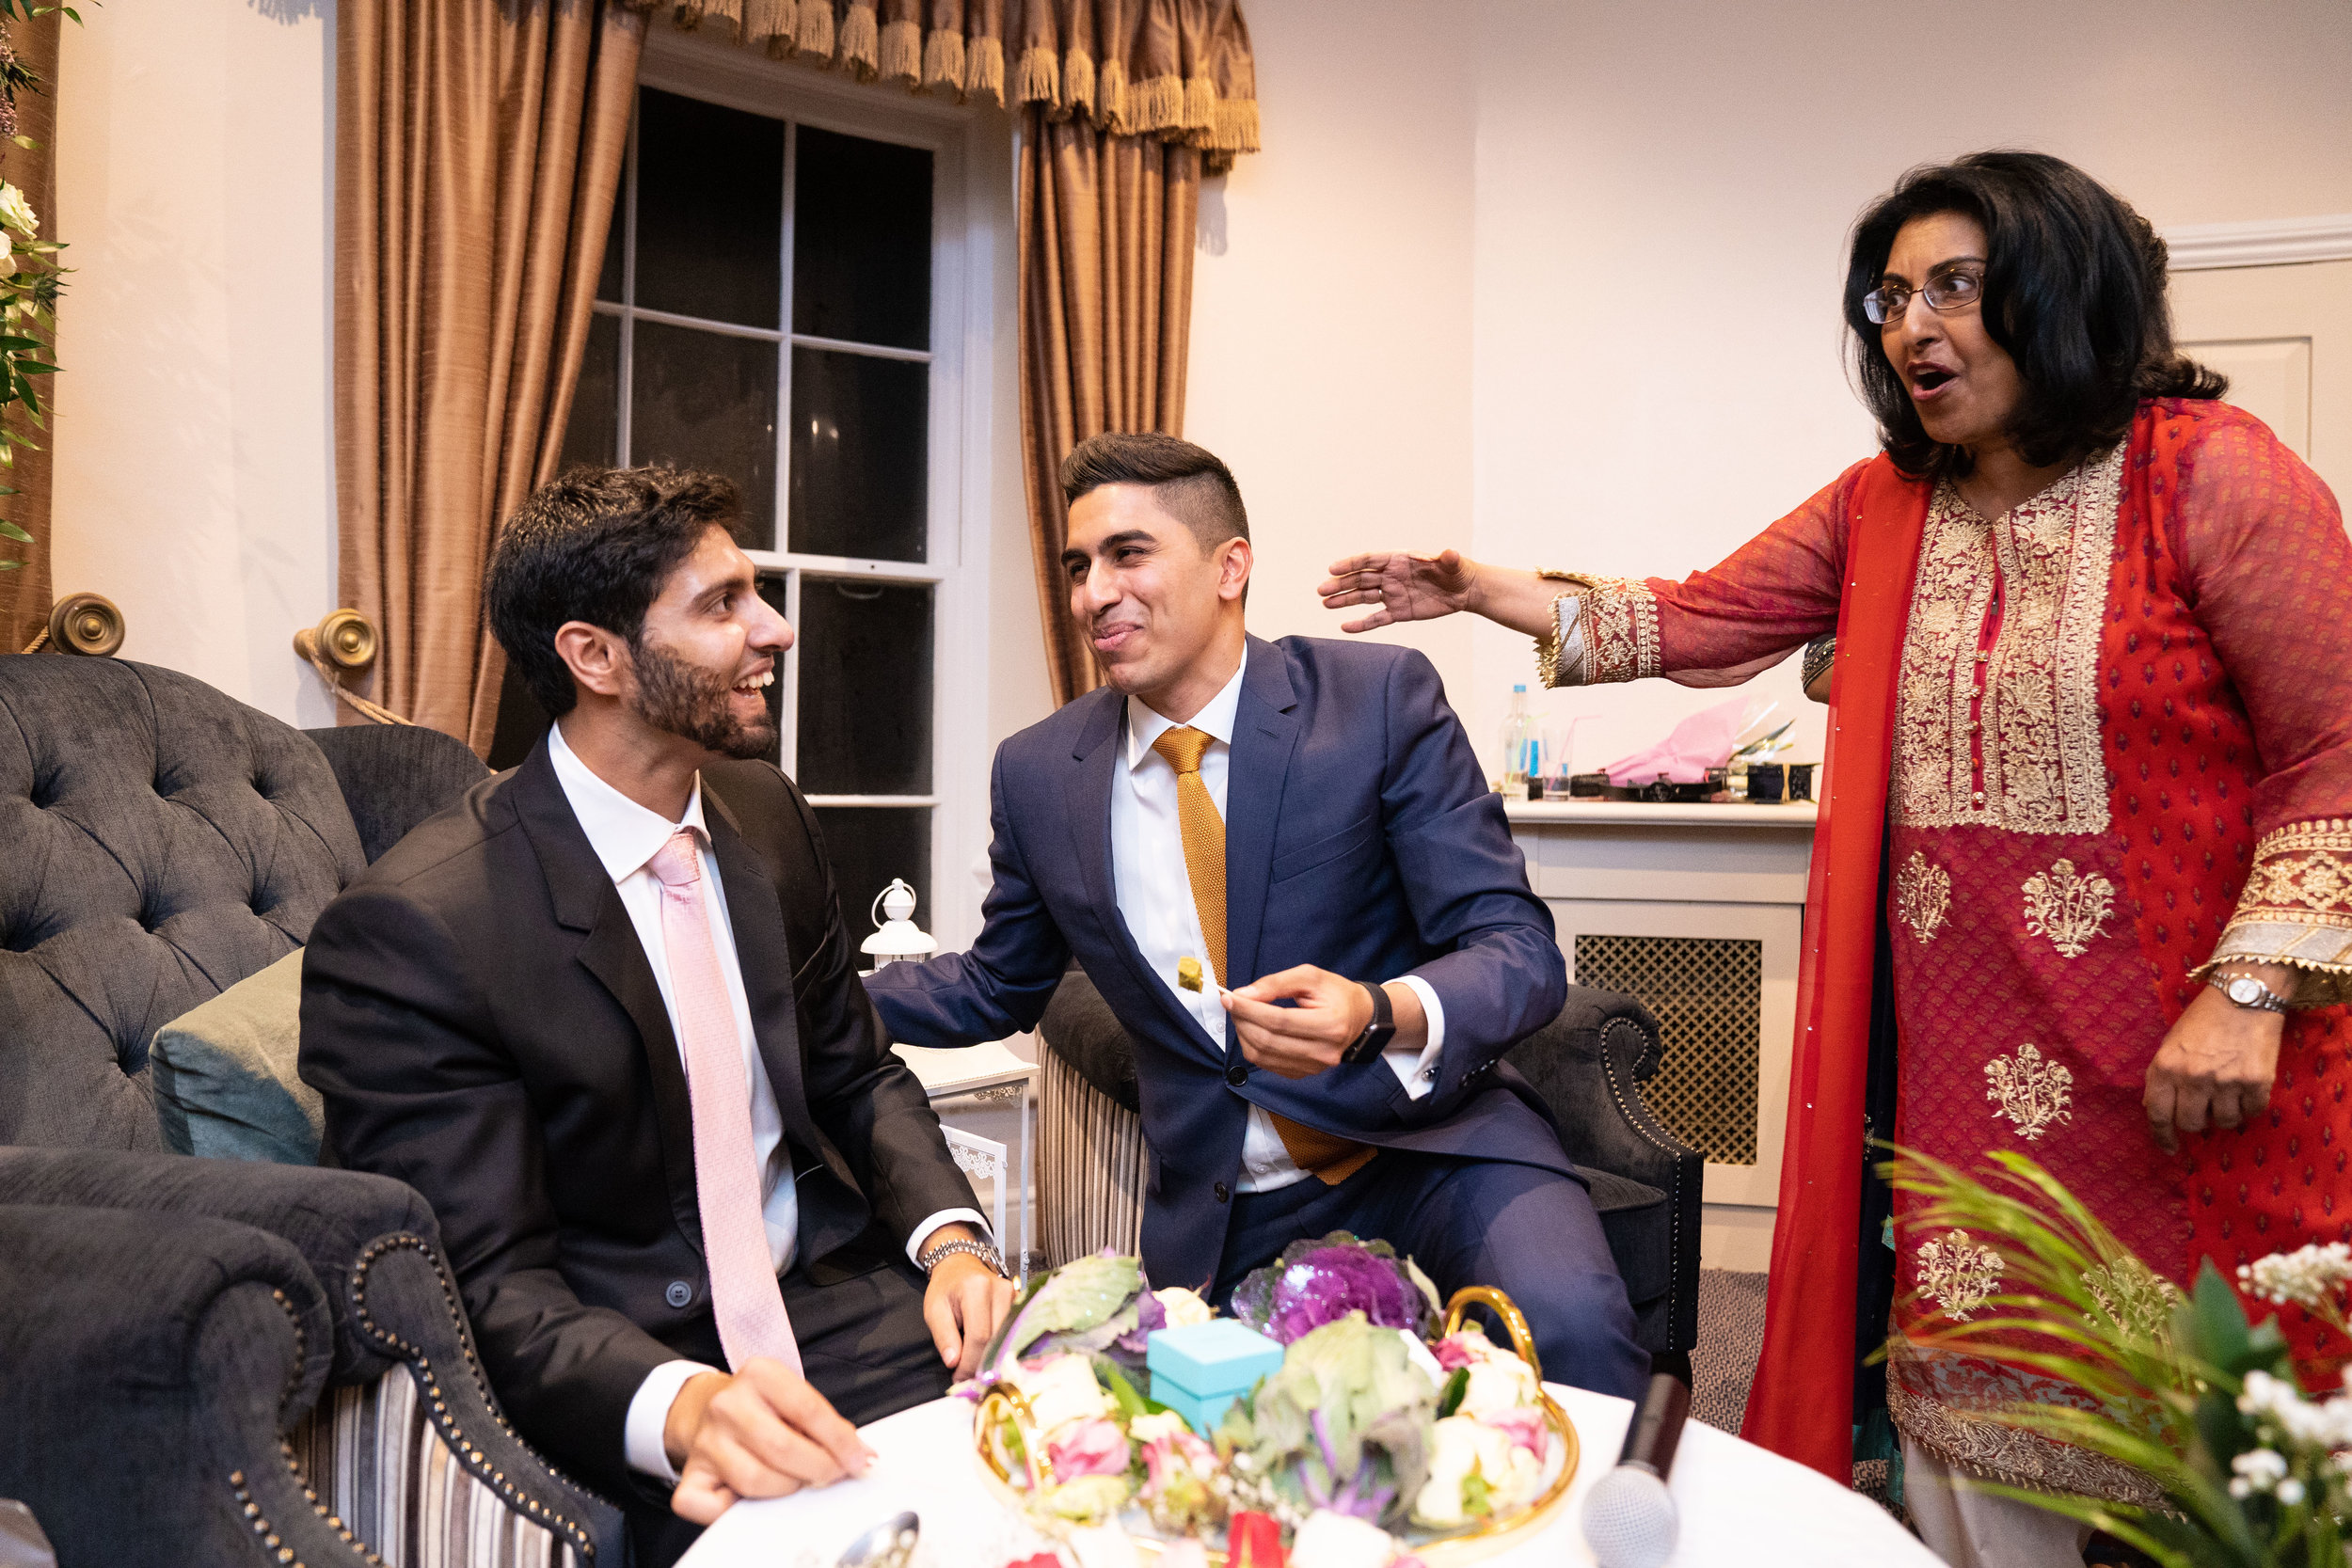 buckinghamshire-golf-club-winter-muslim-wedding-engagement-photography-videography-58